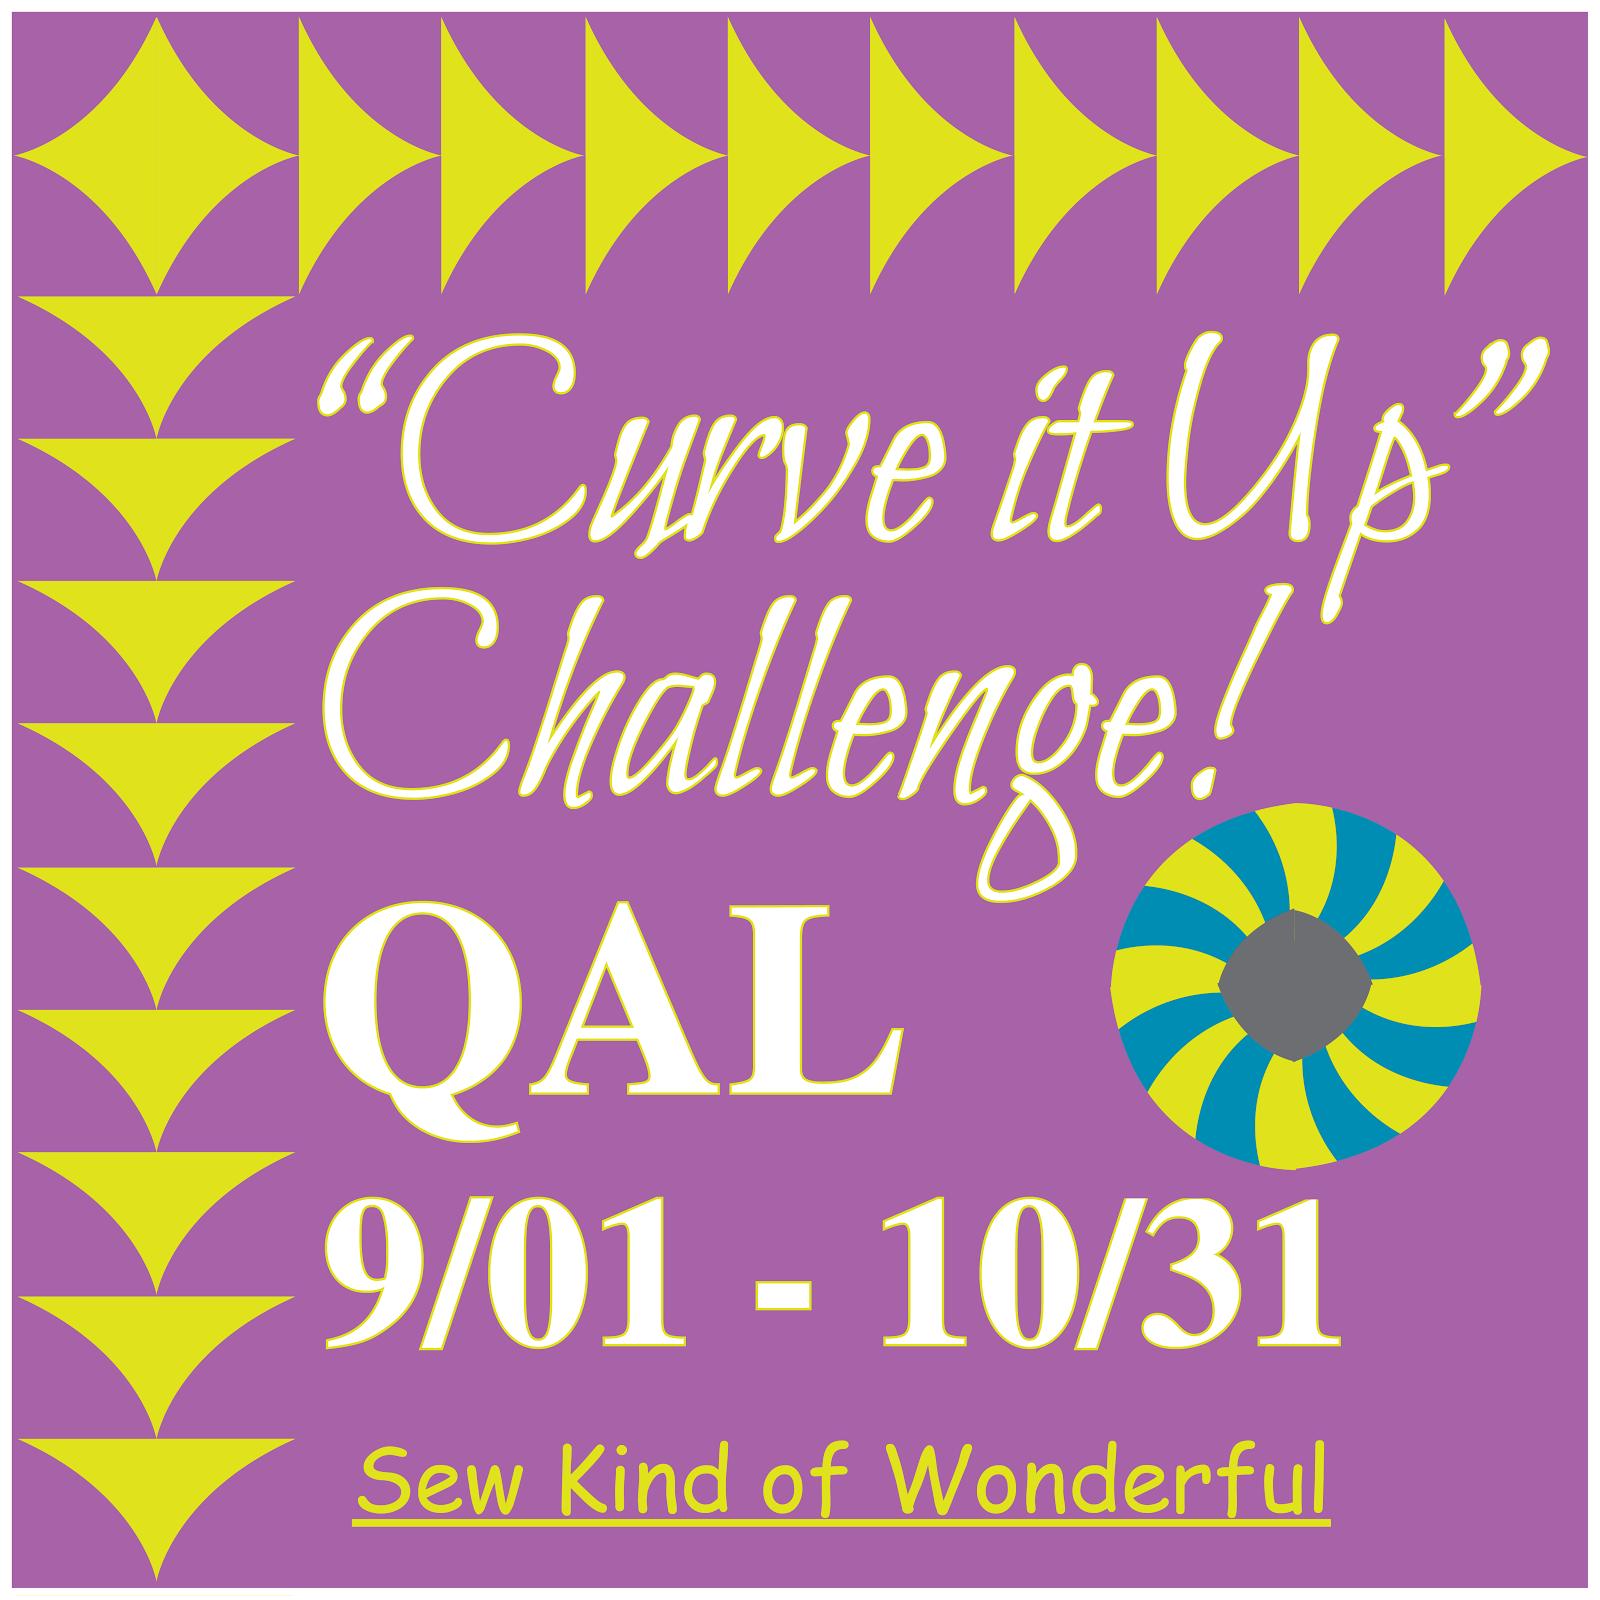 Curve It Up QAL!